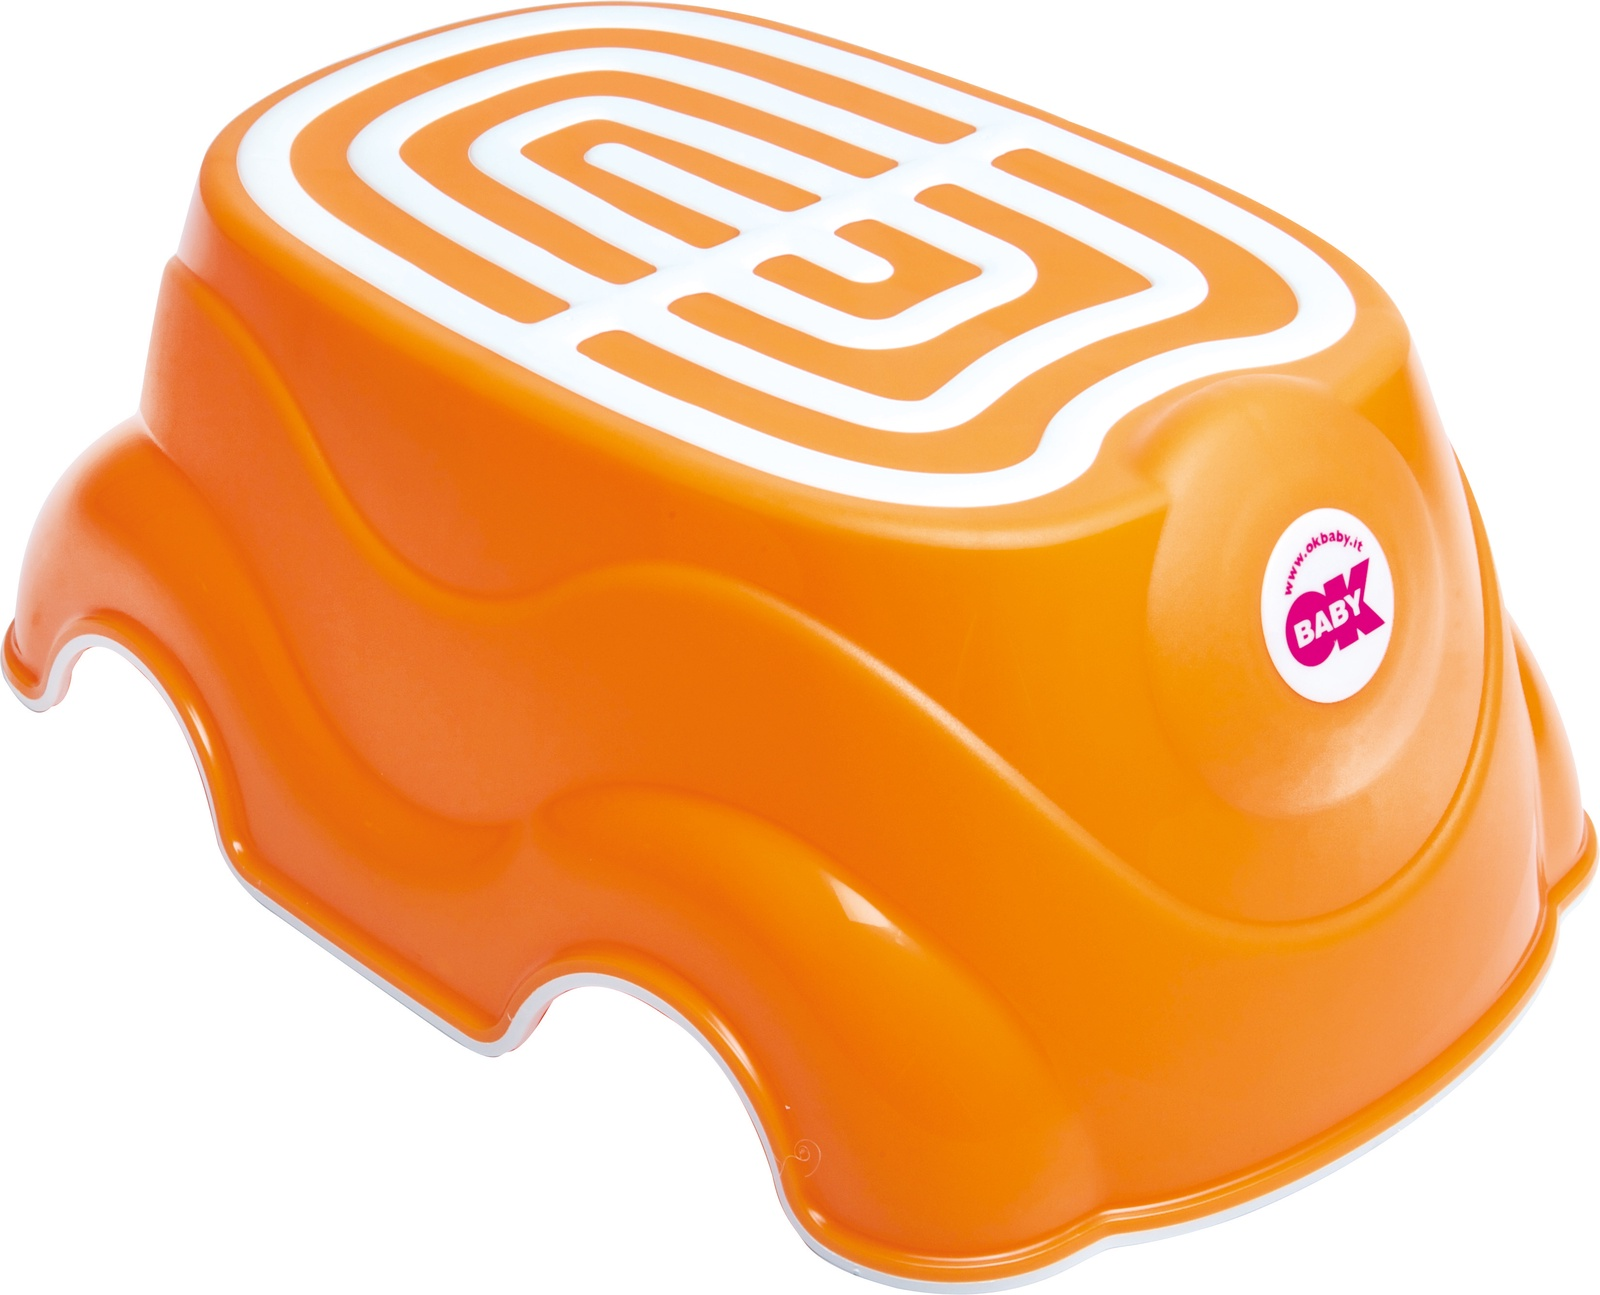 Подставка для ванночки ОК Ваву HERBIE оранжевый